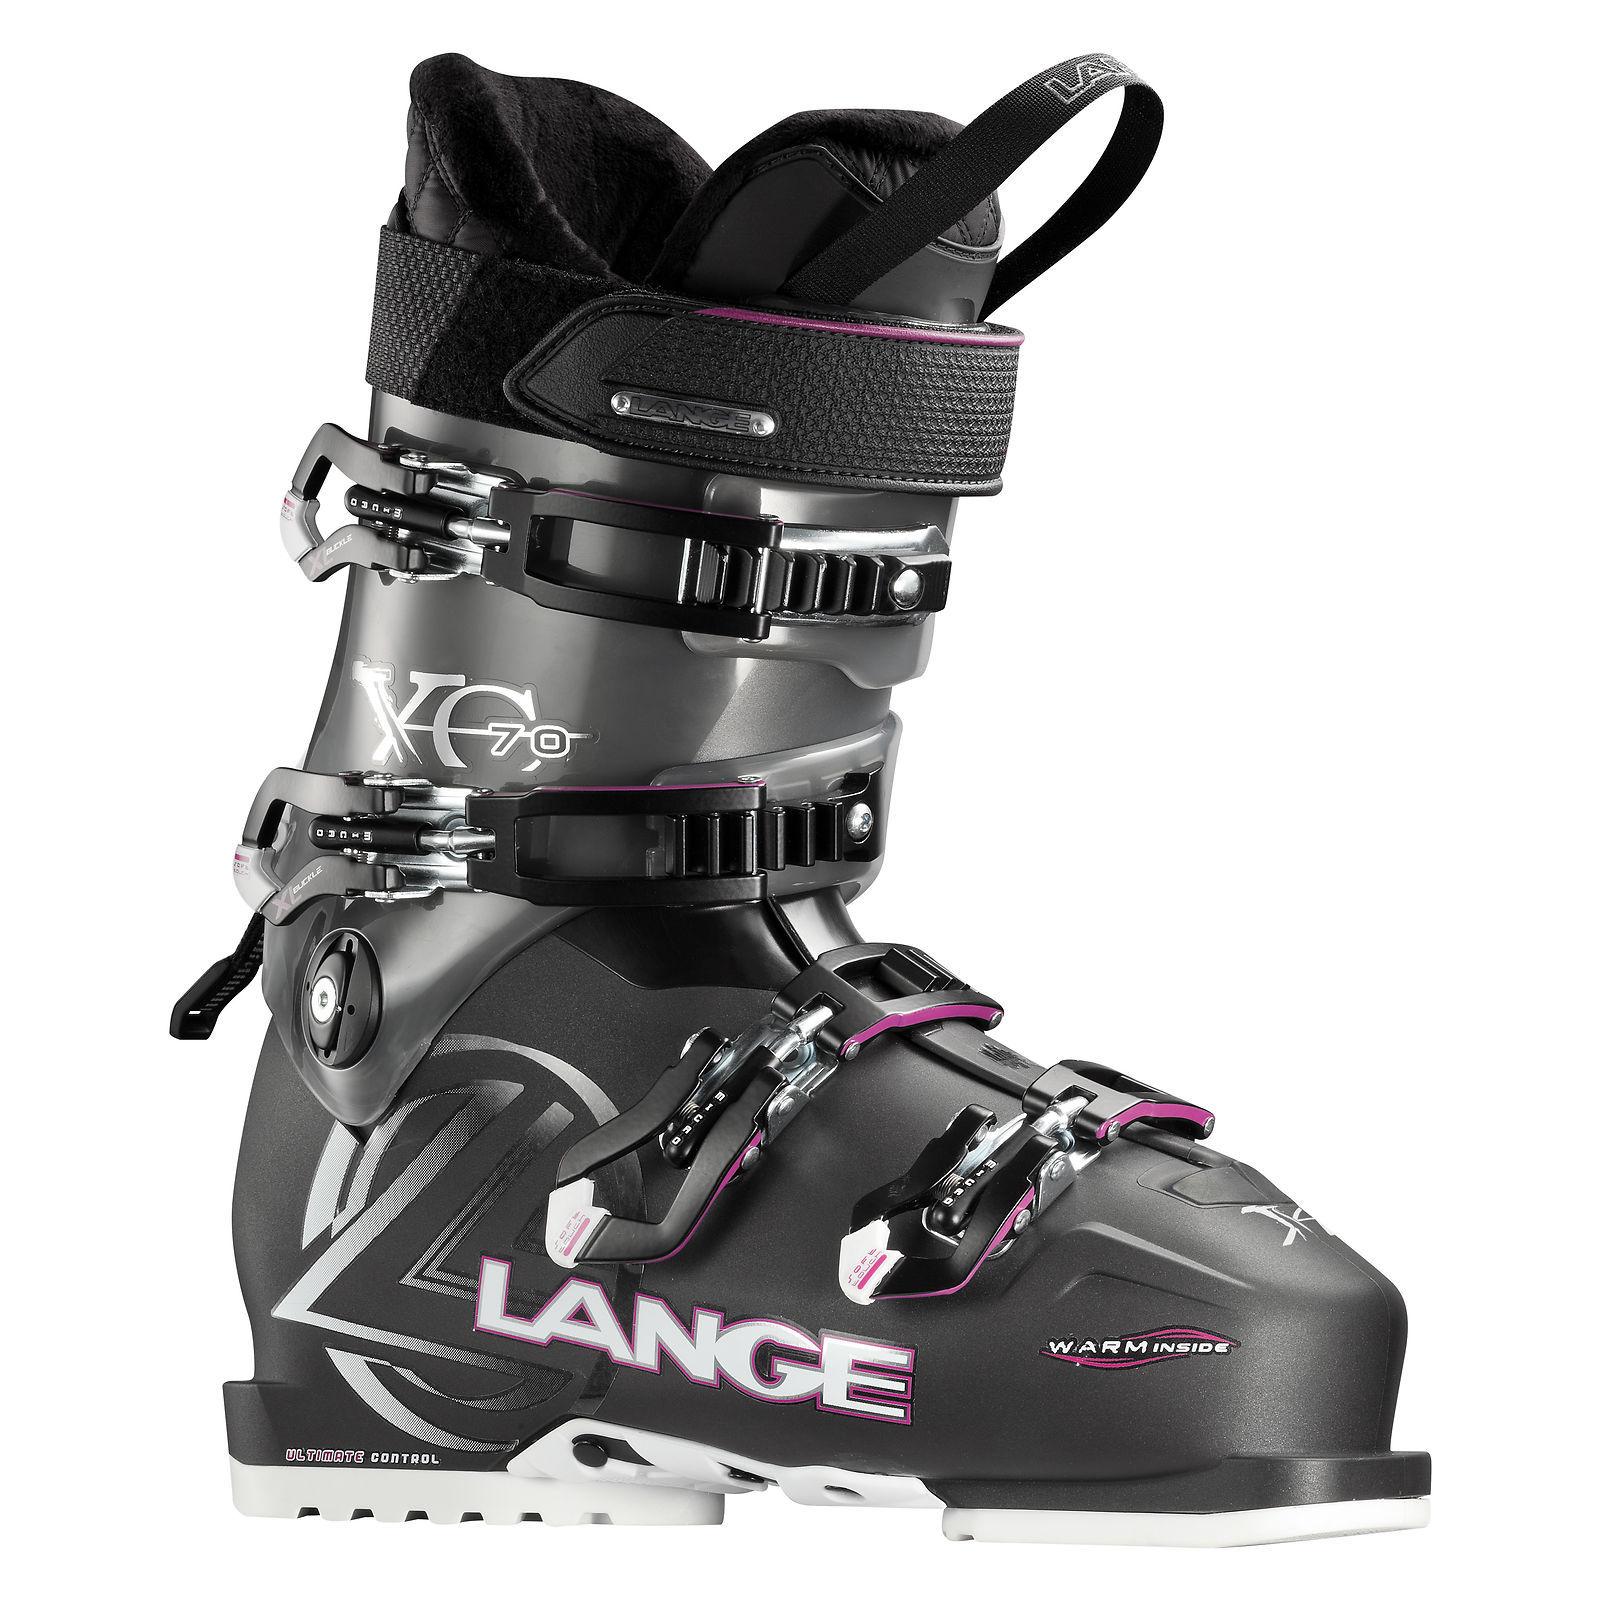 Buty Lange XC 70W LBD8240 F70